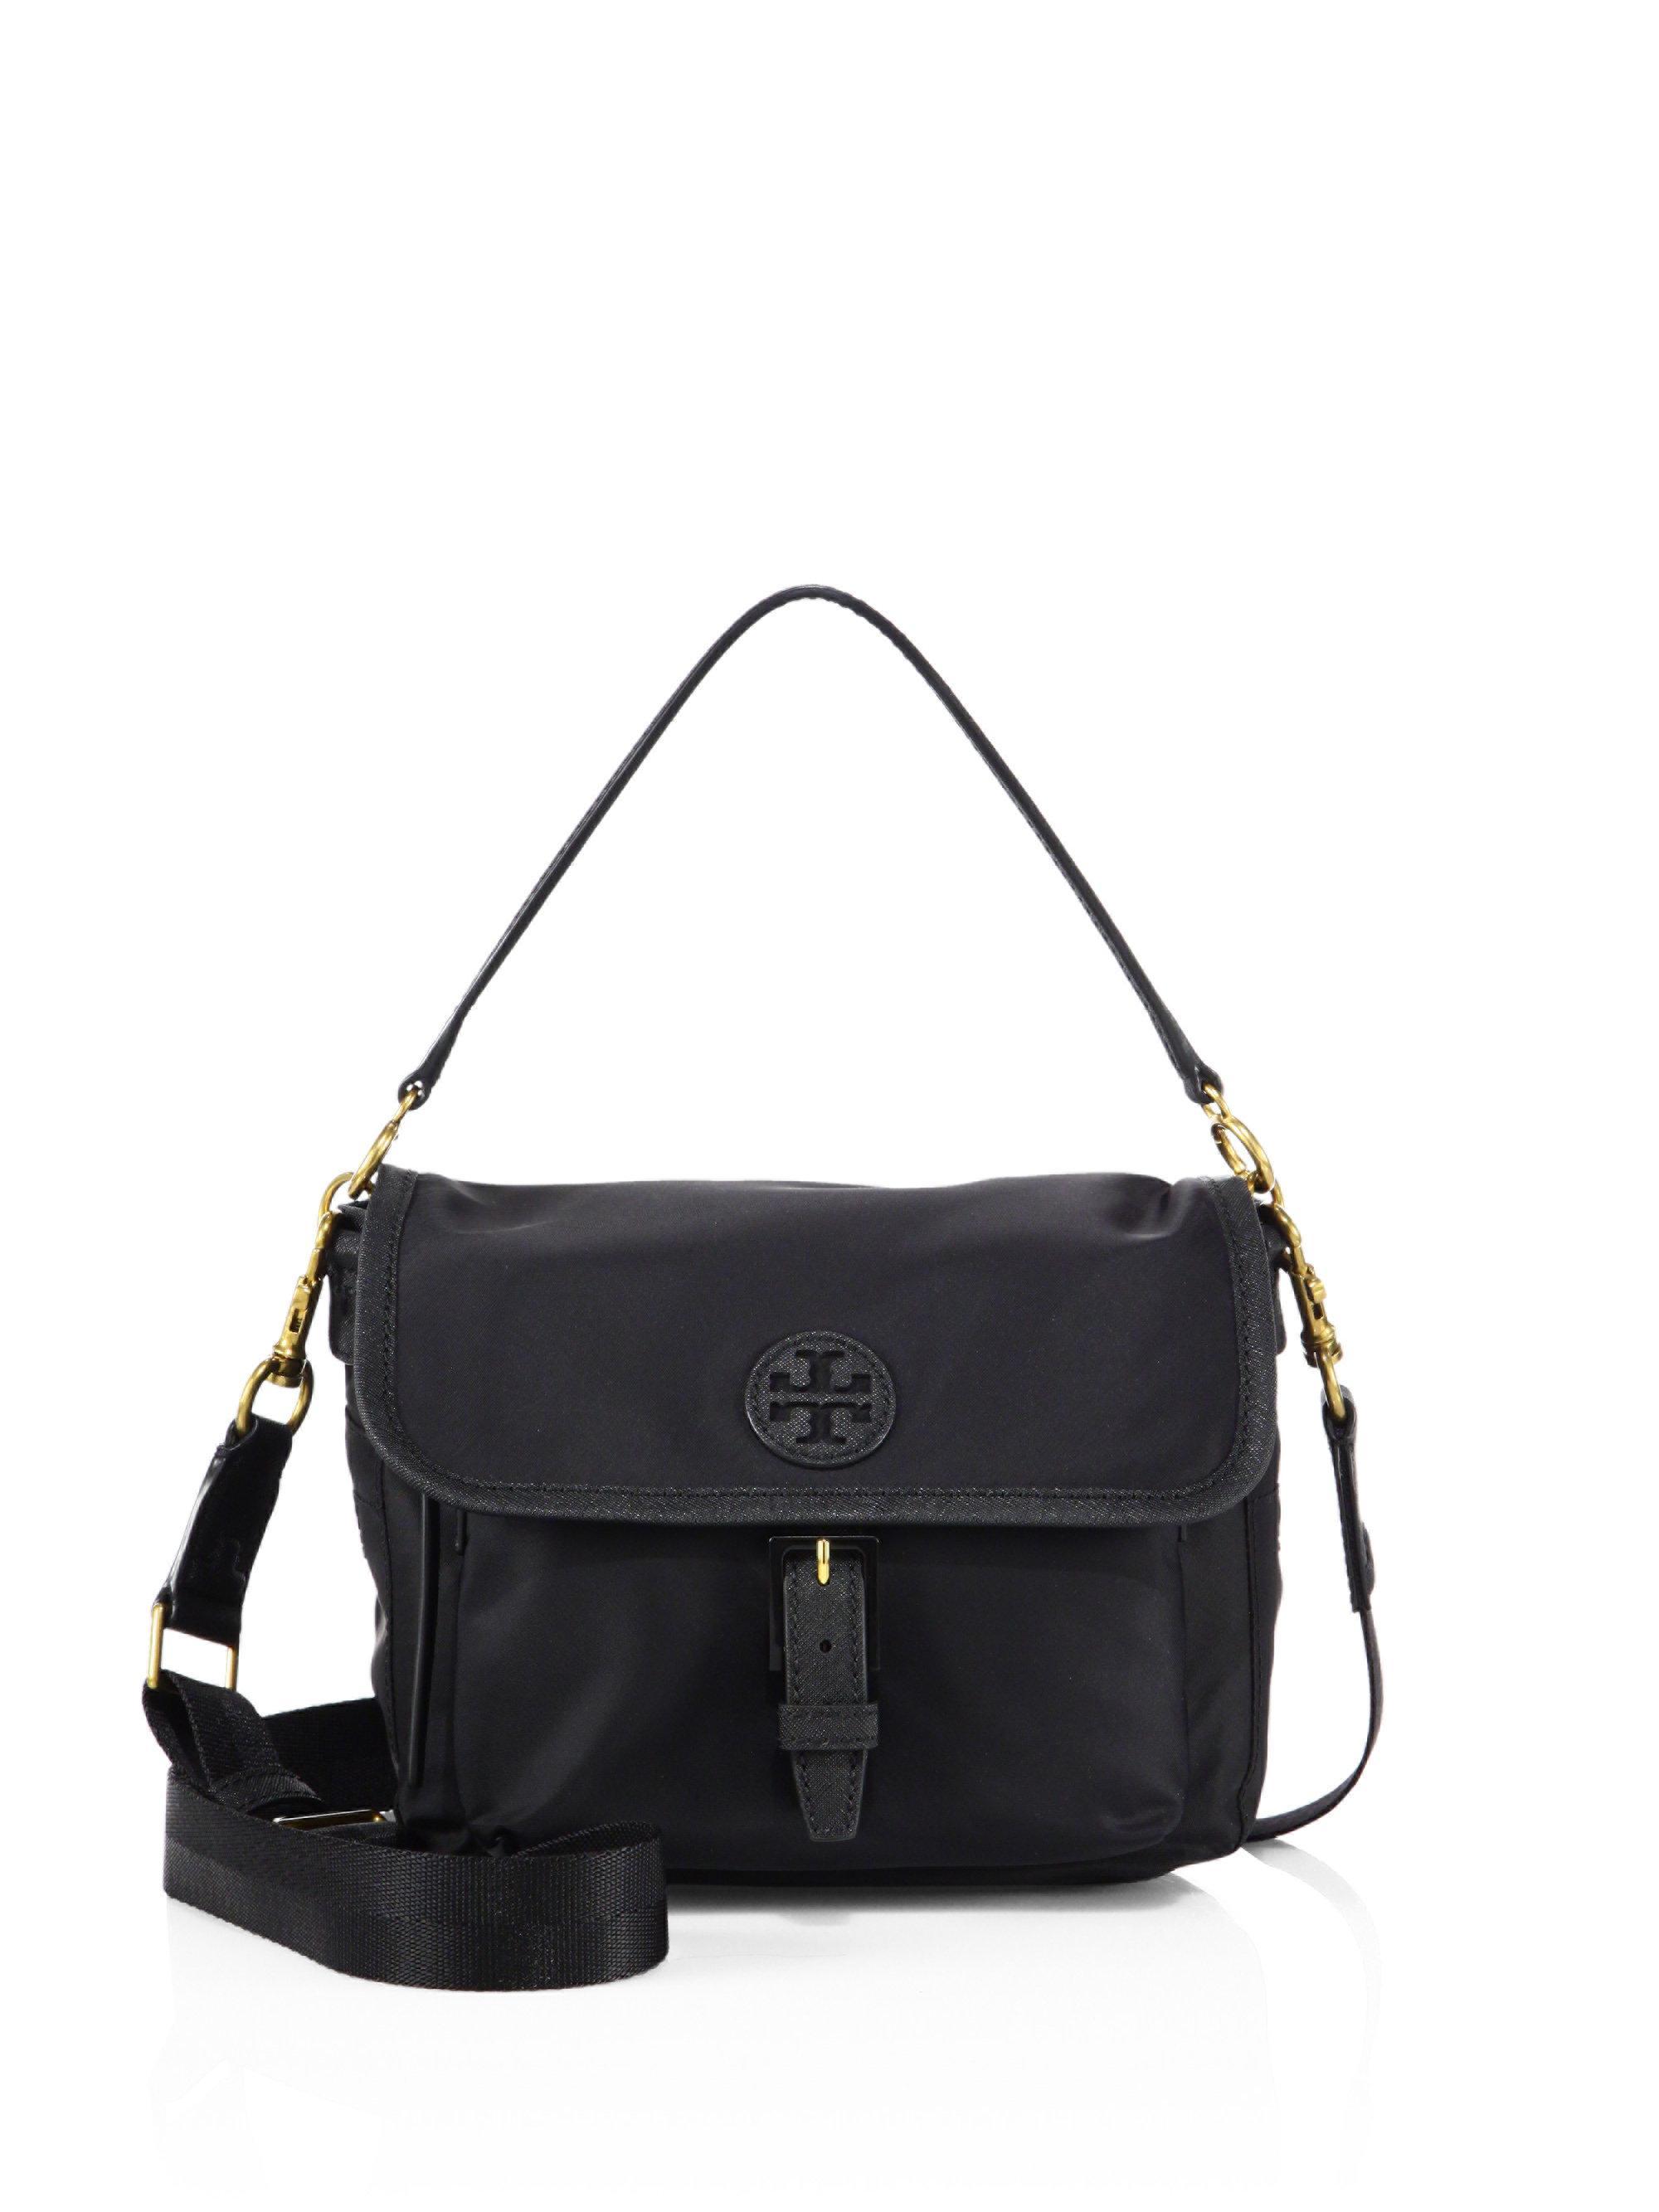 53f93616080 Lyst - Tory Burch Scout Nylon Crossbody Bag in Black